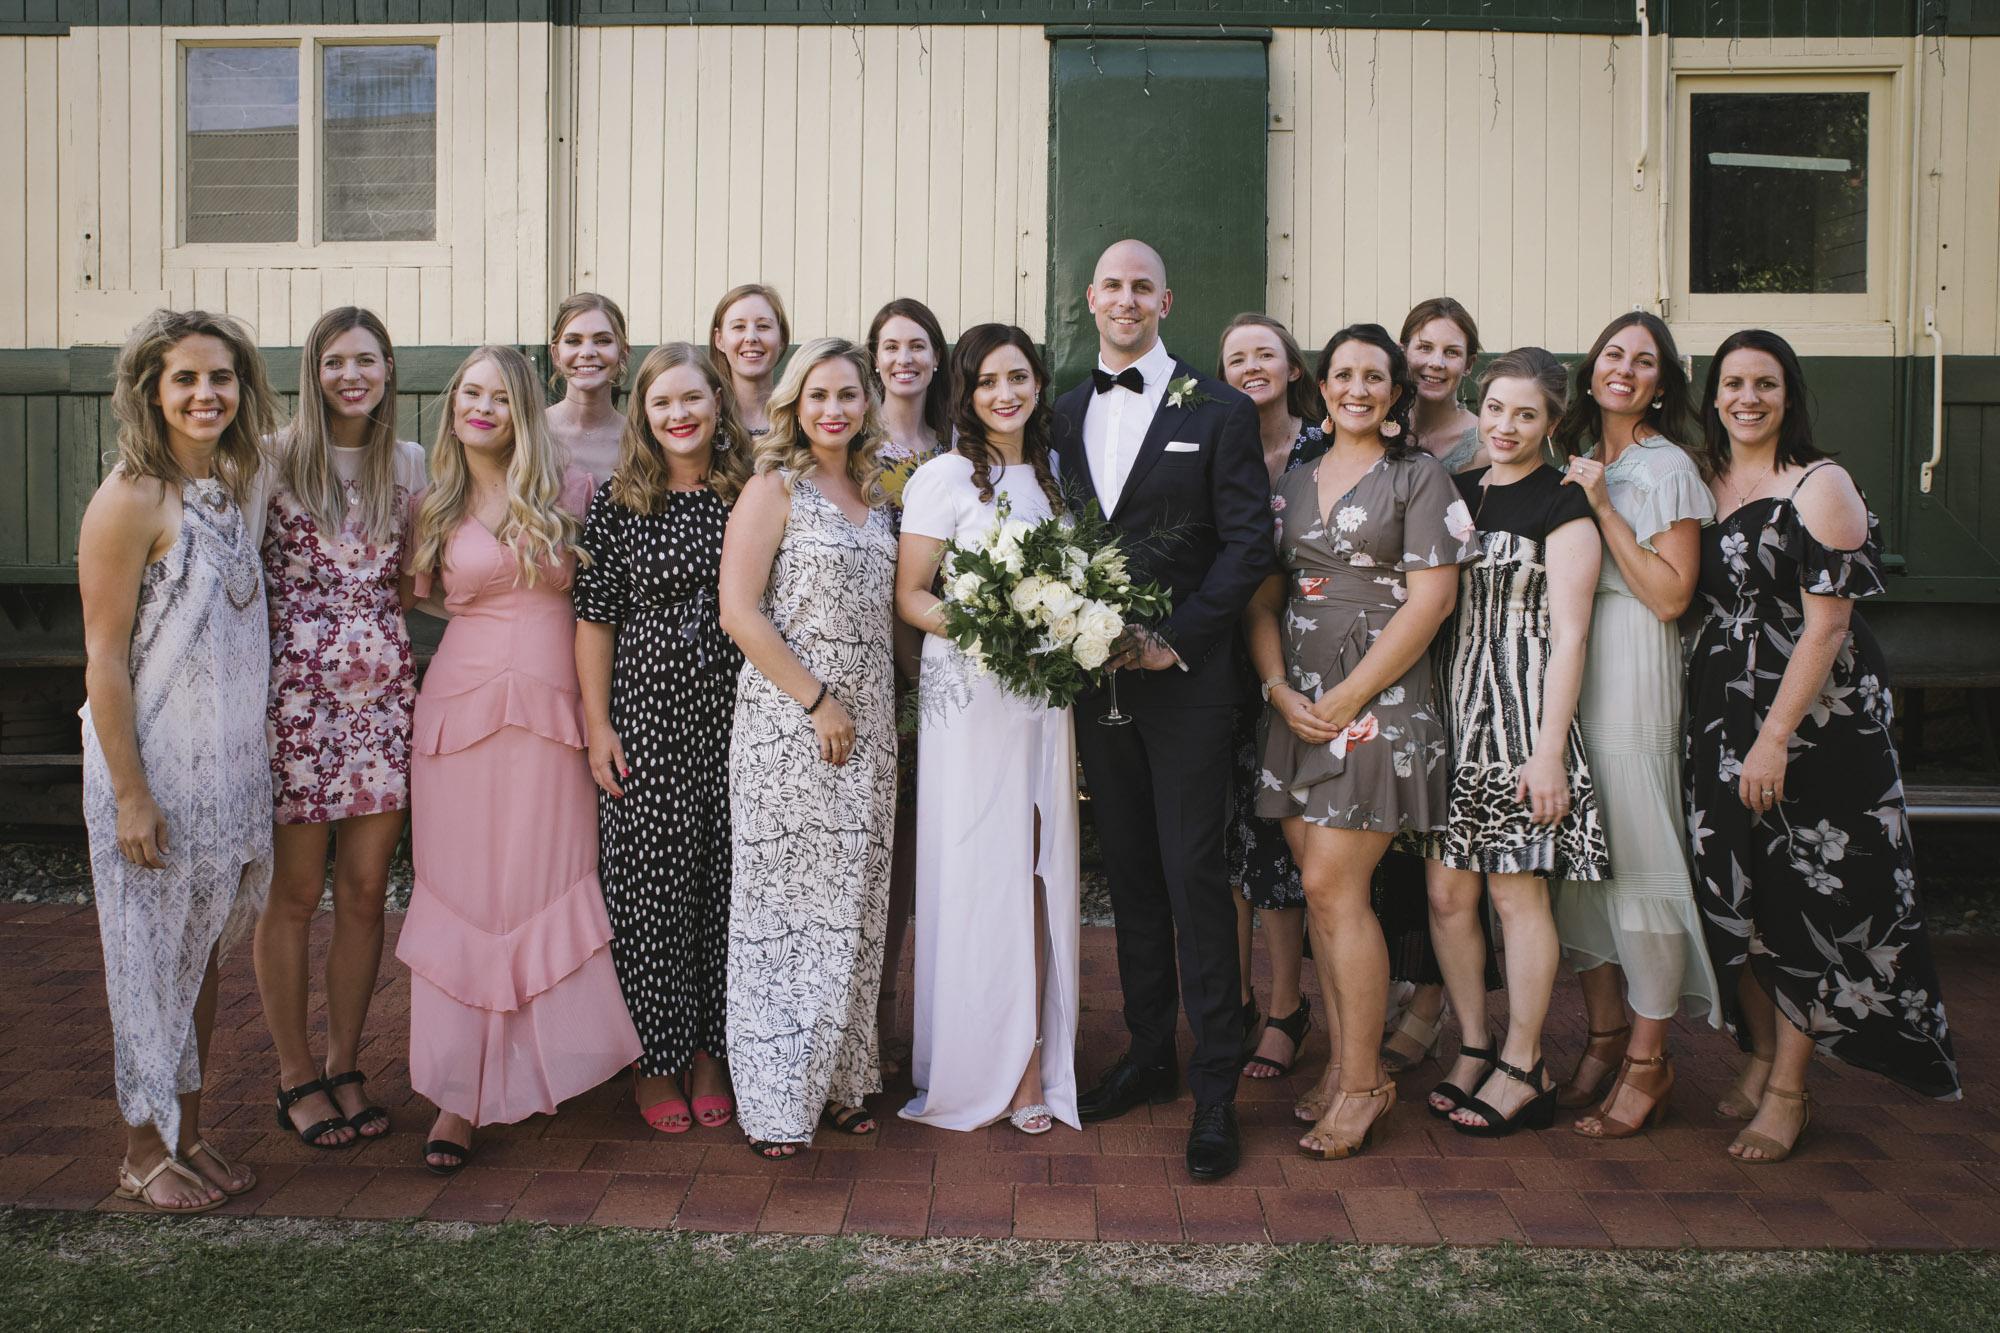 Angie-Roe-Photography-Wedding-Perth-Northam-Wheatbelt-Country-Rural (114).jpg